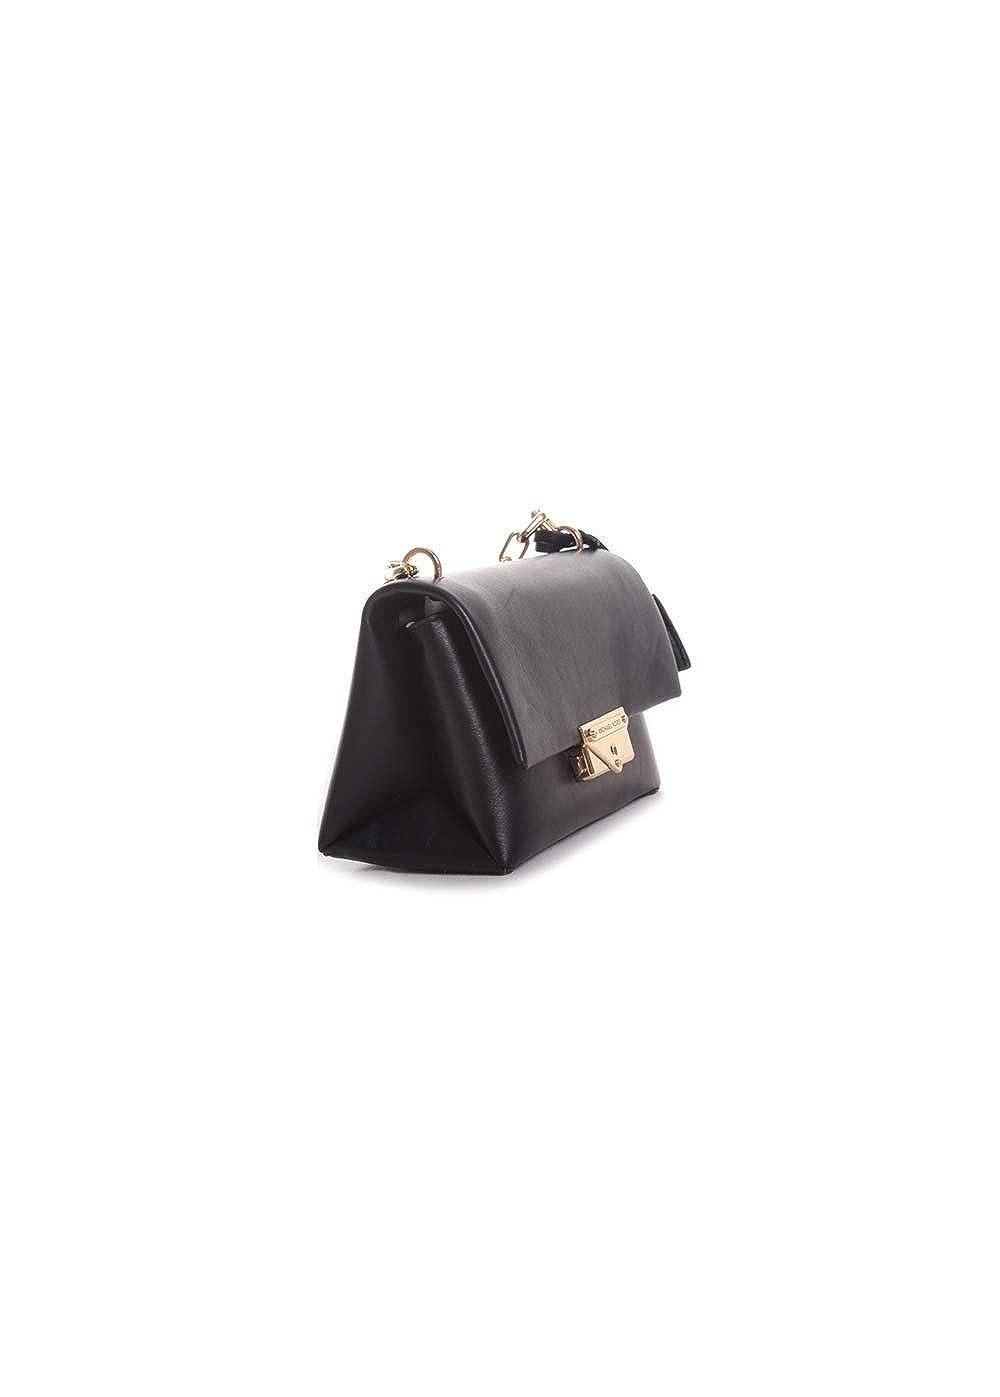 541bcd96b746 Amazon.com  Michael Kors CeCe Extra-Small Chain Crossbody Handbag in Black   Clothing